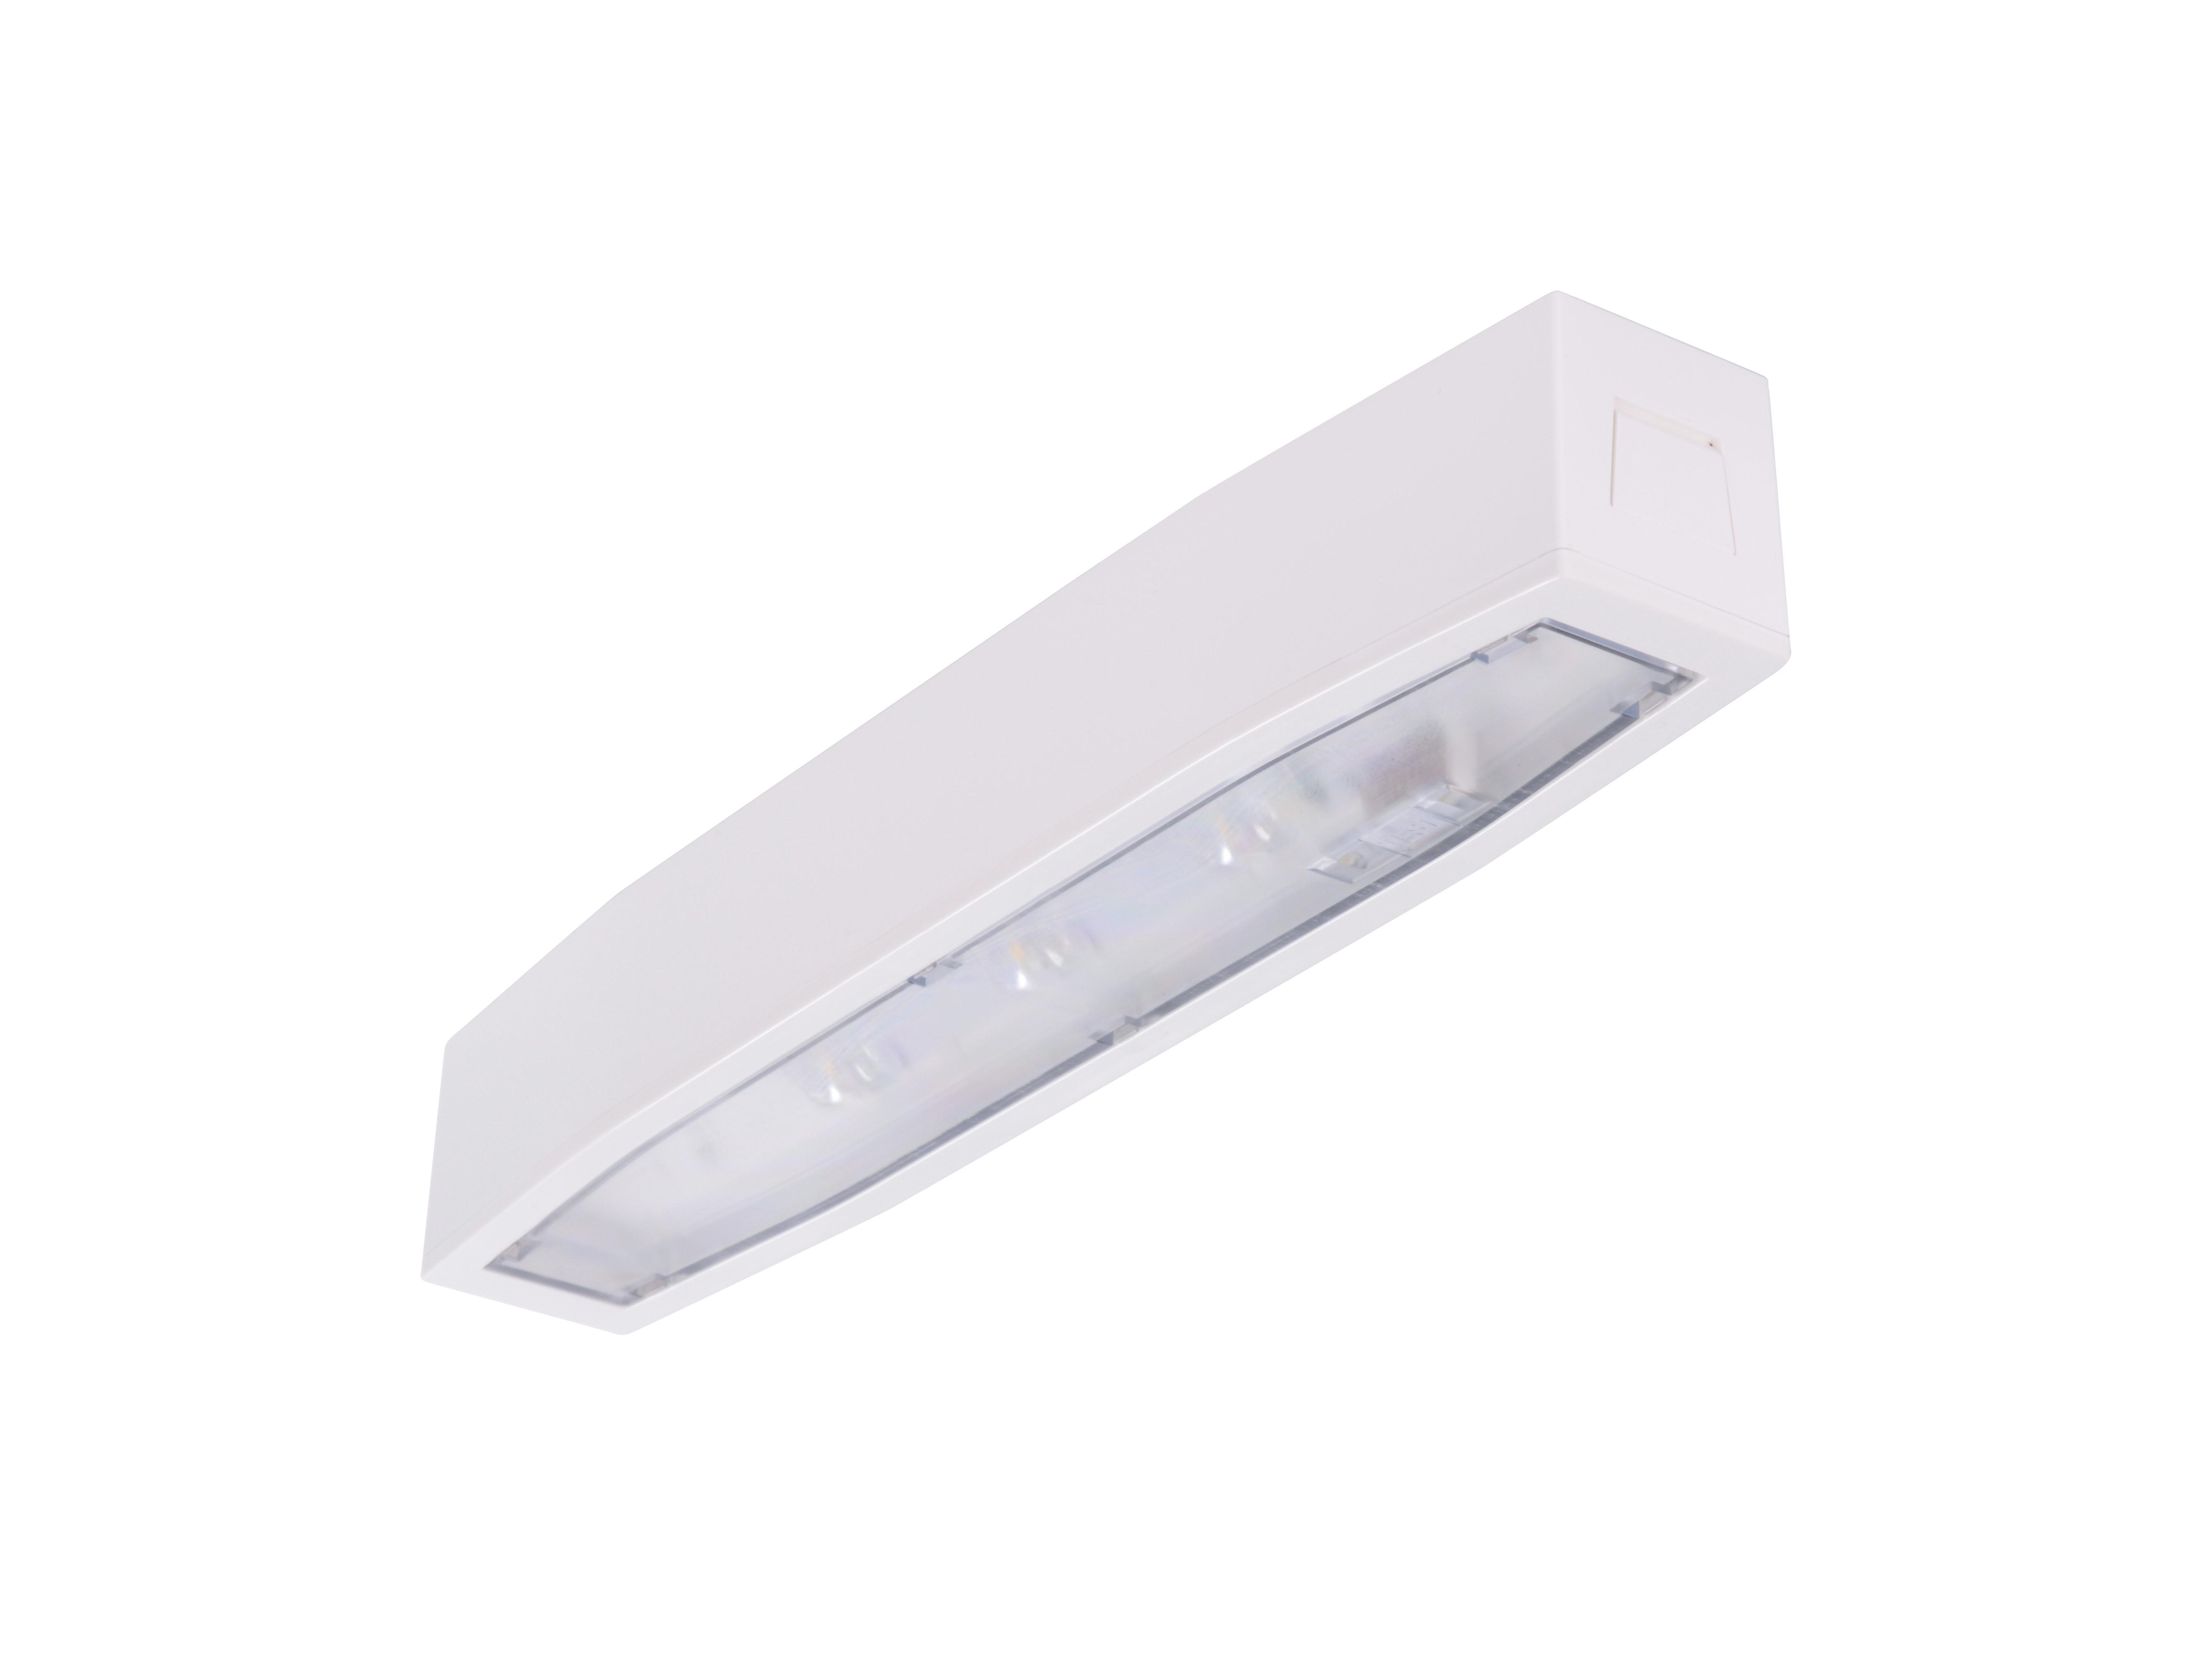 Lampa emergenta led Intelight 94525   2h nementinut test automat 0